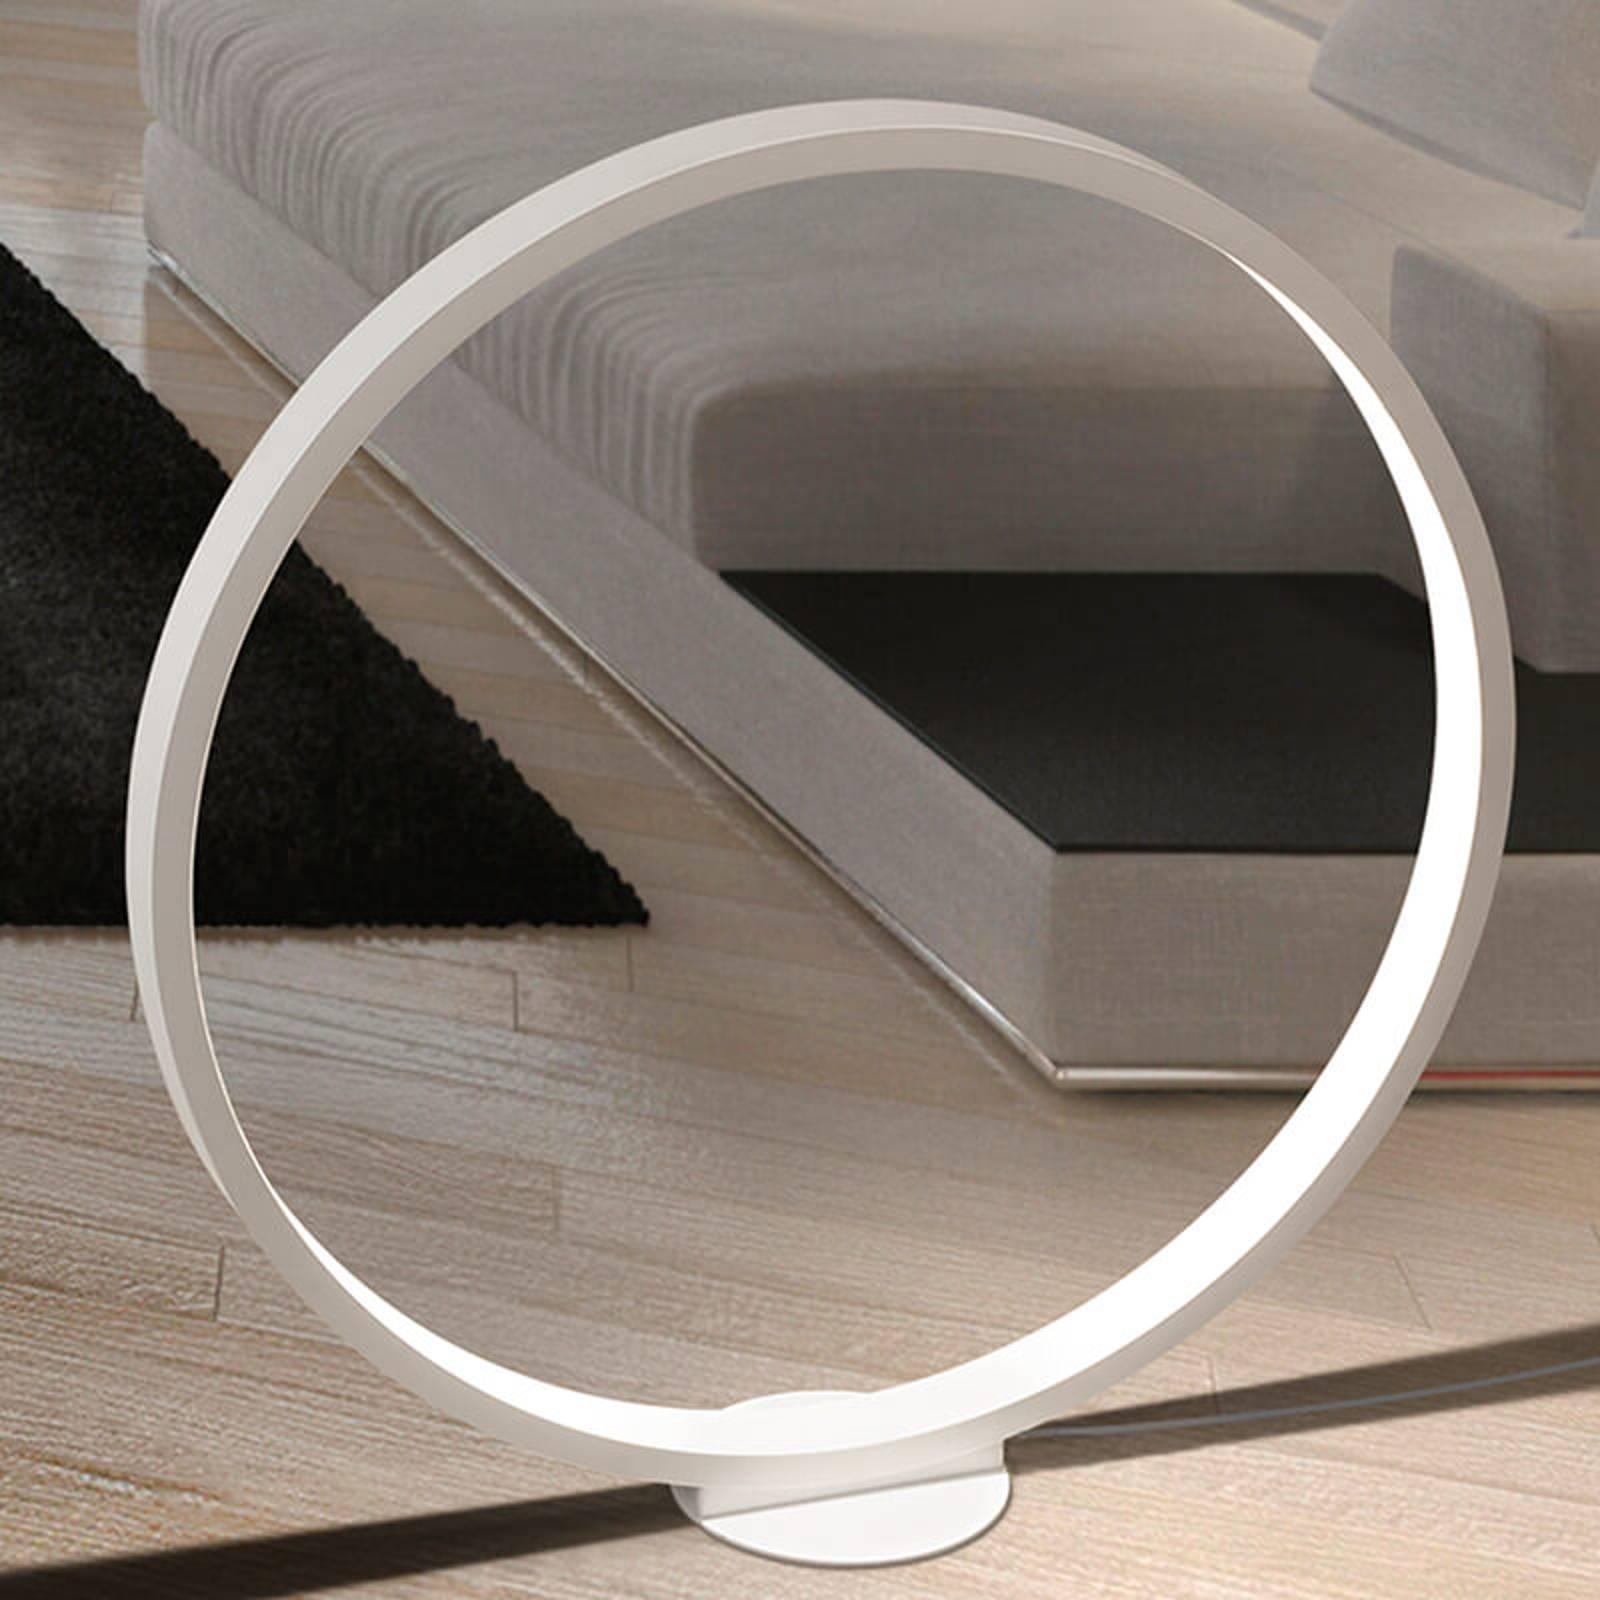 Cini&Nils Assolo valkoinen LED-lattiavalaisin himm